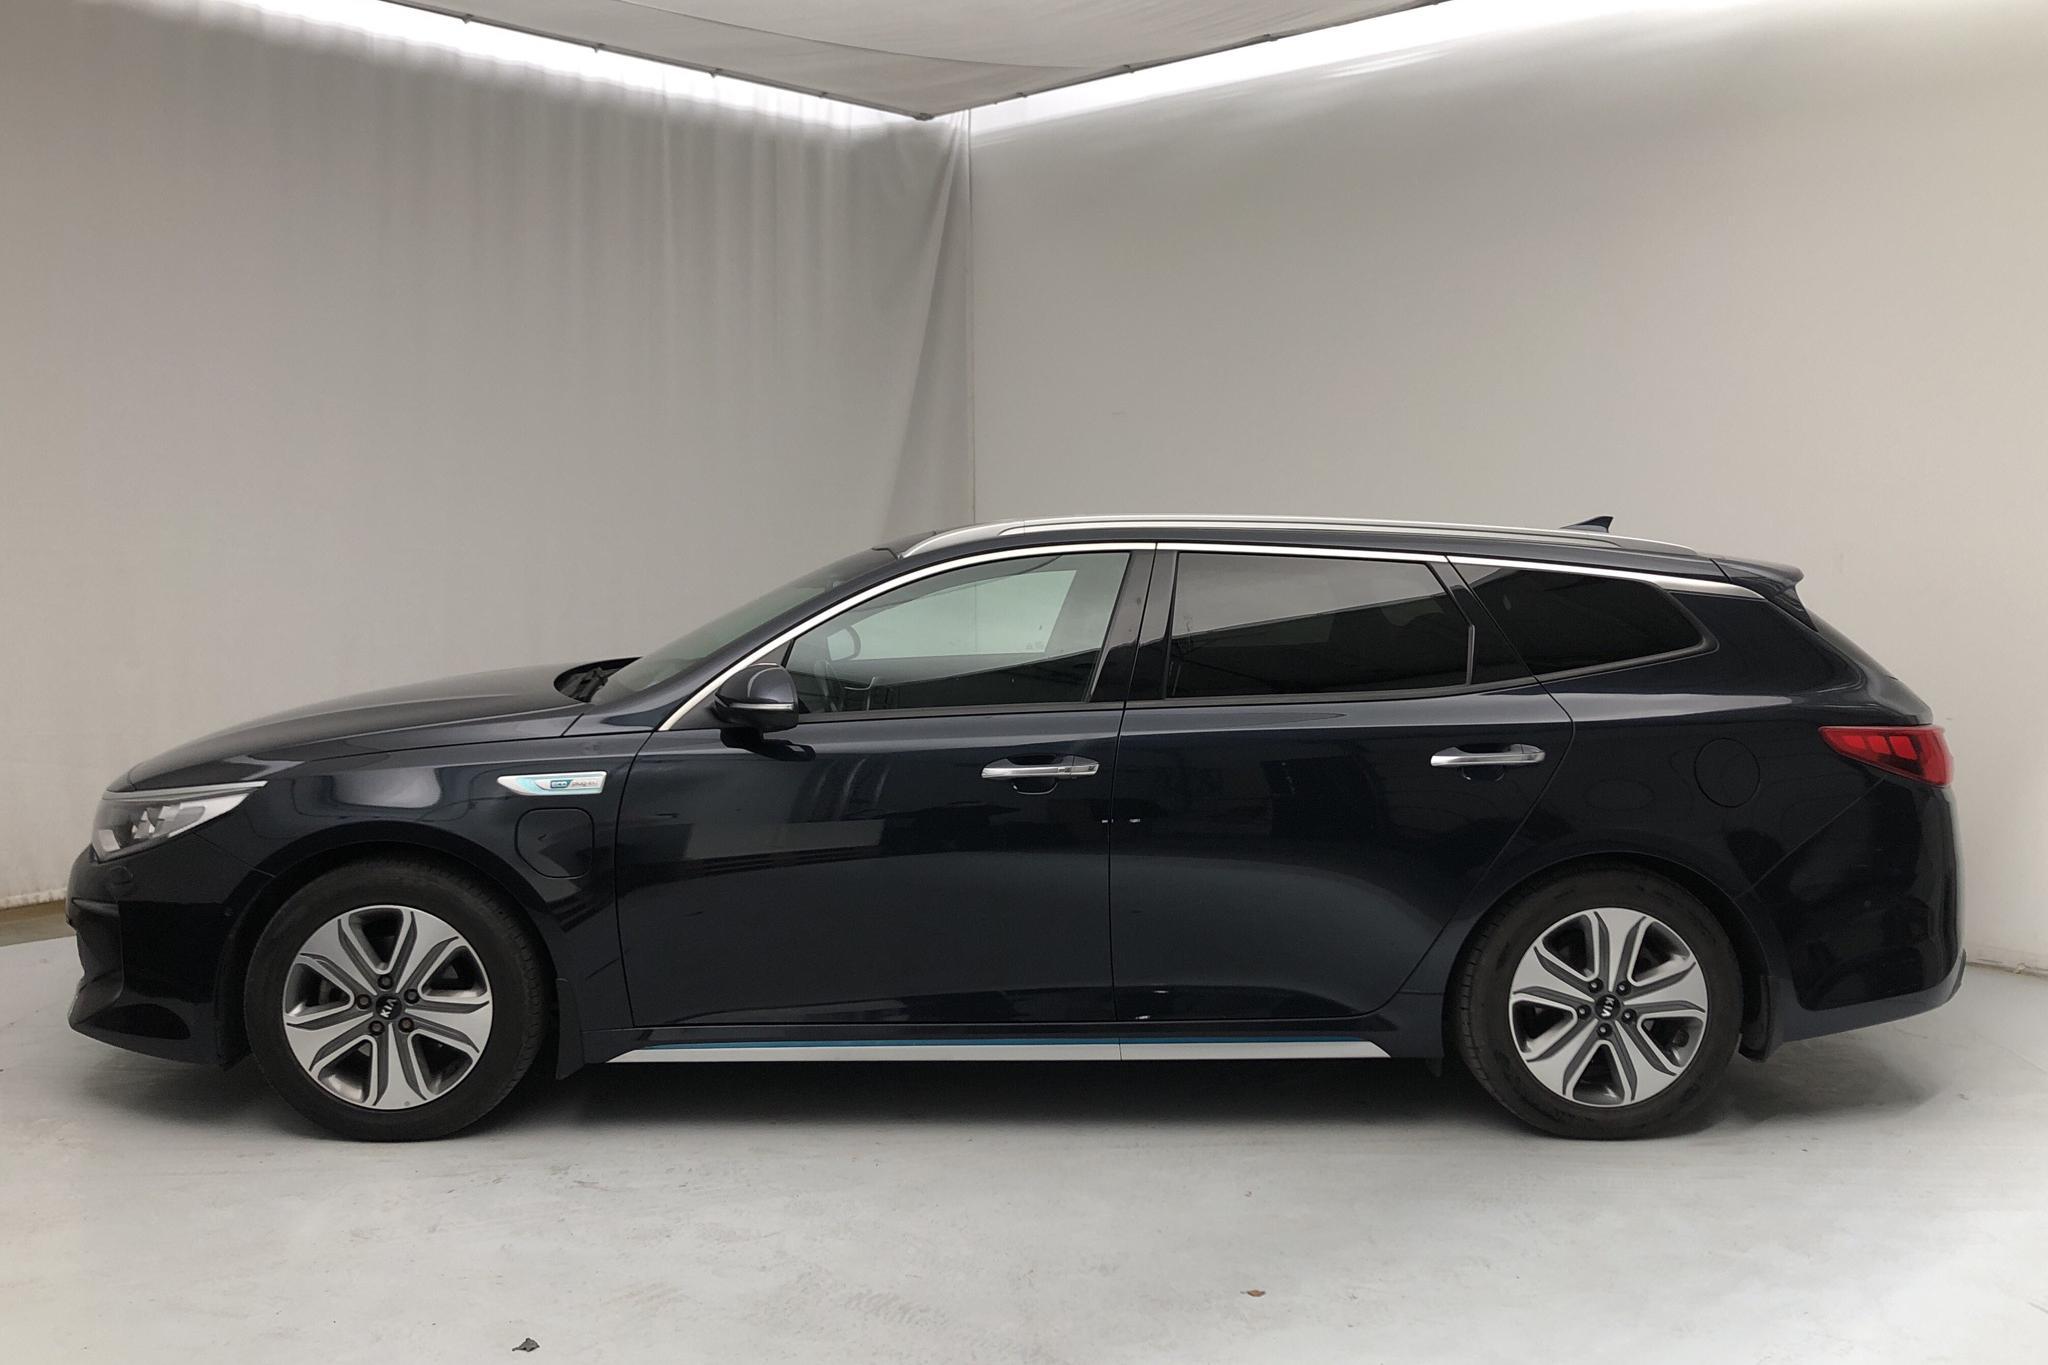 KIA Optima 2.0 GDi Plug-in Hybrid SW (205hk) - 49 940 km - Automatic - blue - 2018